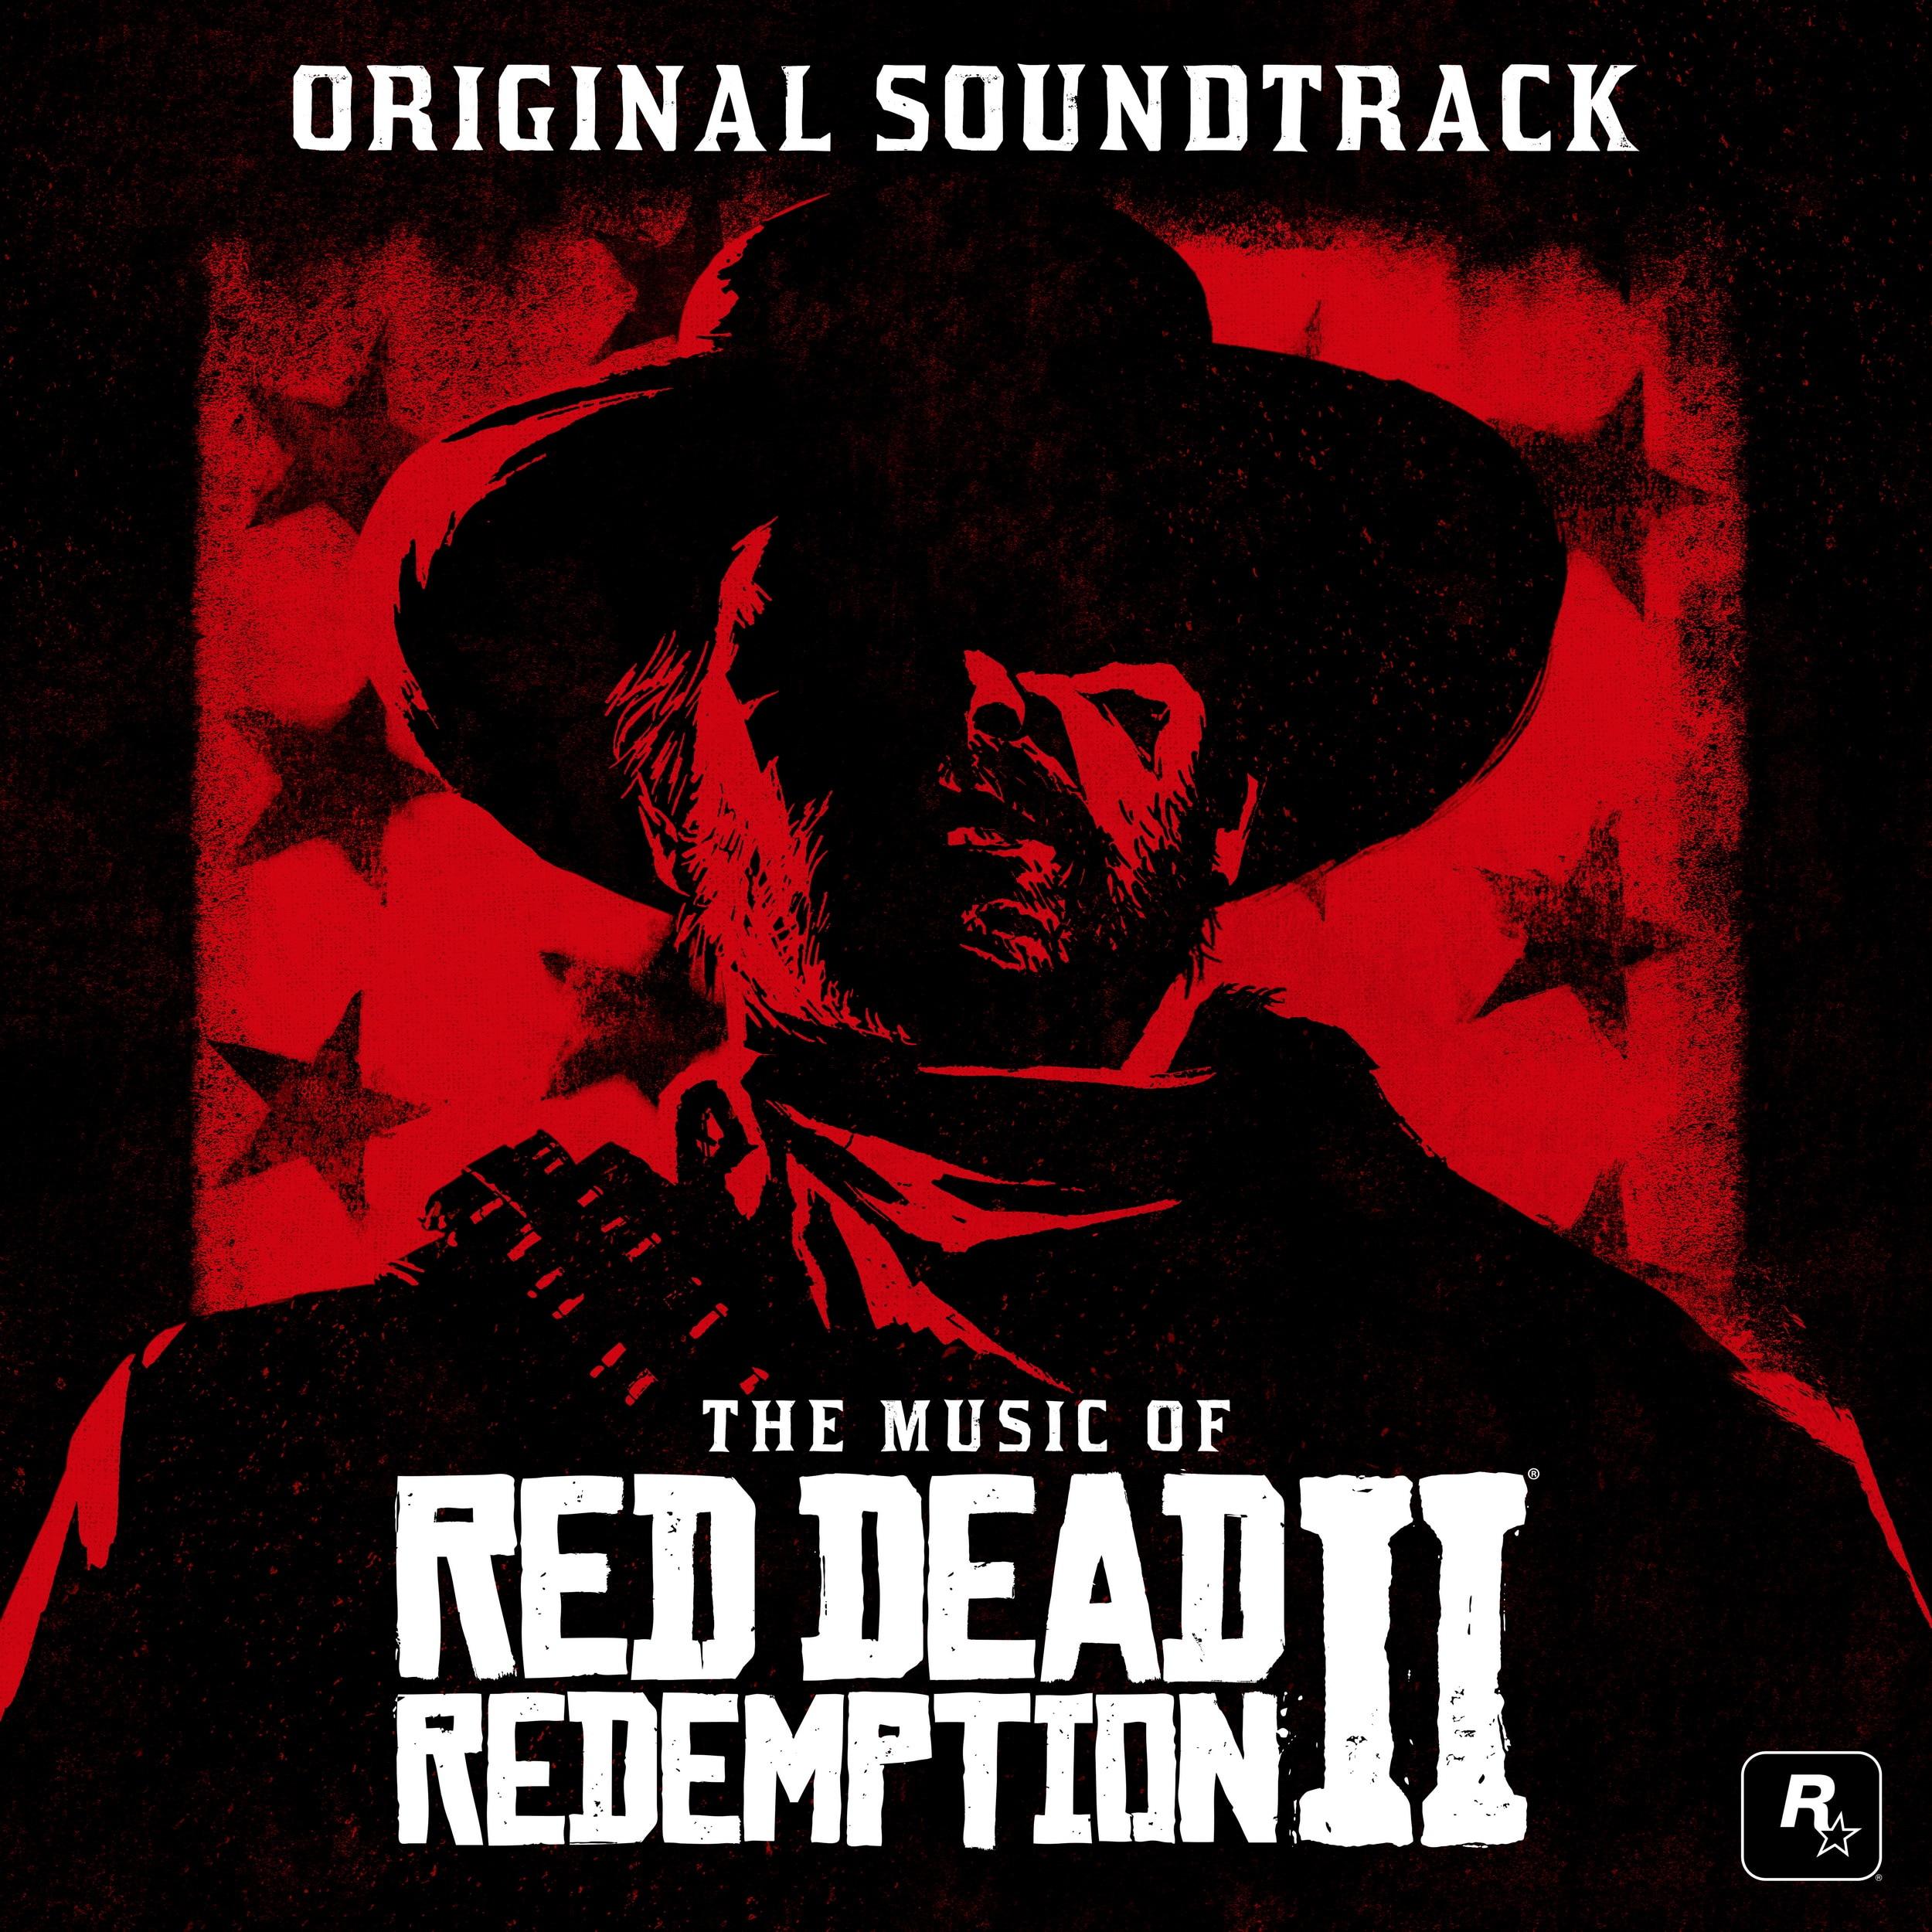 The Music of Red Dead Redemption 2 Original Soundtrack,GamerSRD